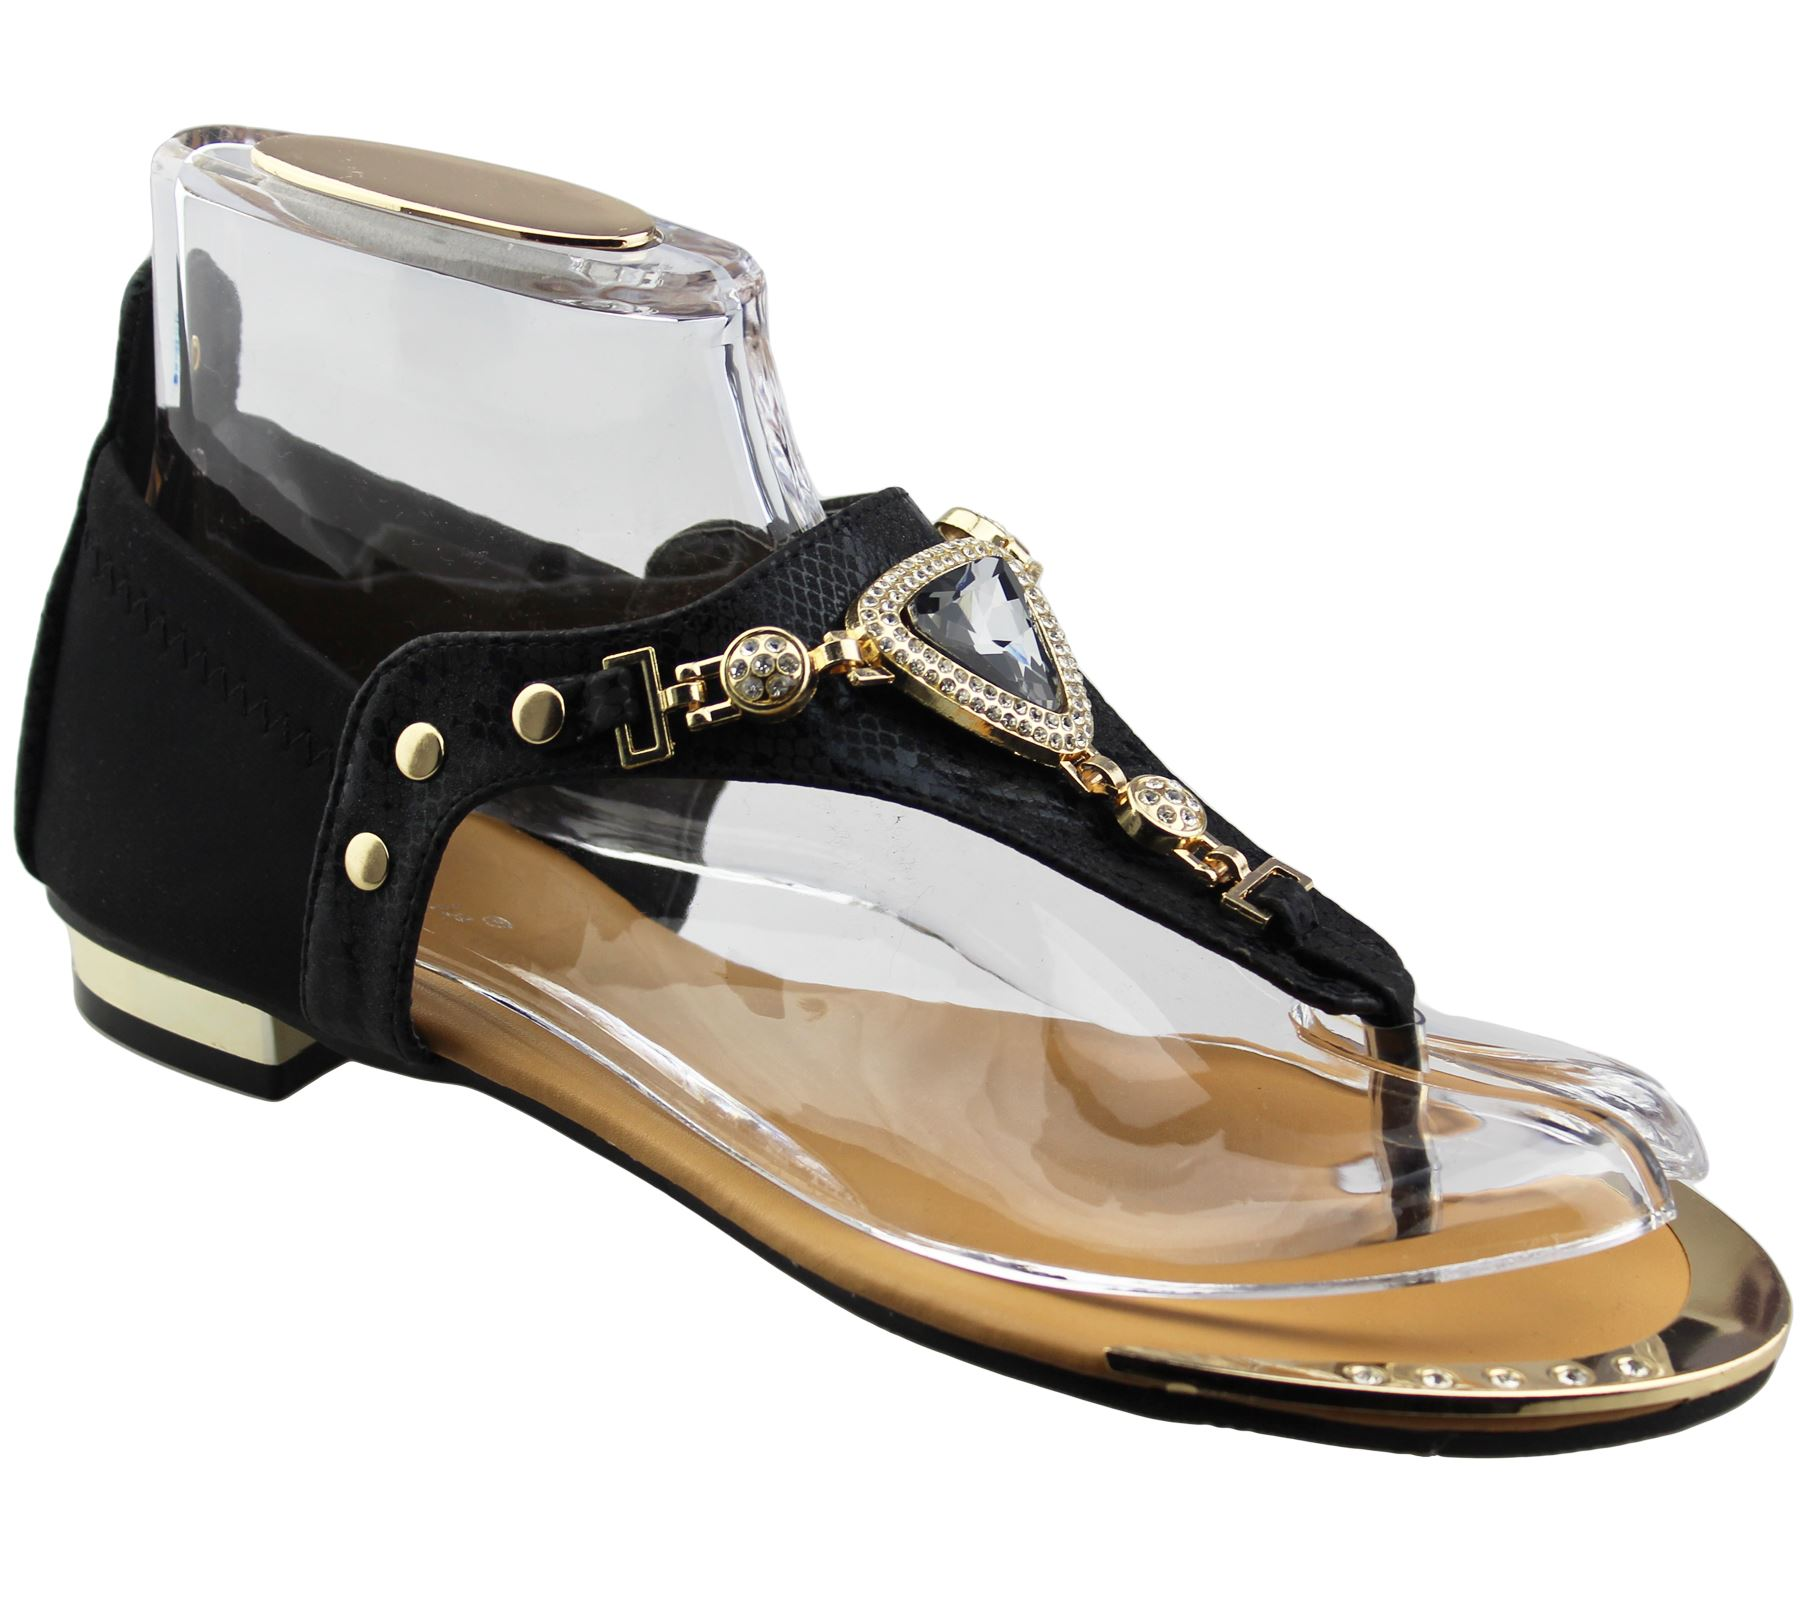 Womens-Flat-Summer-Sandals-Ladies-Diamante-Wedding-Toe-Post-Casual-Slipper thumbnail 5